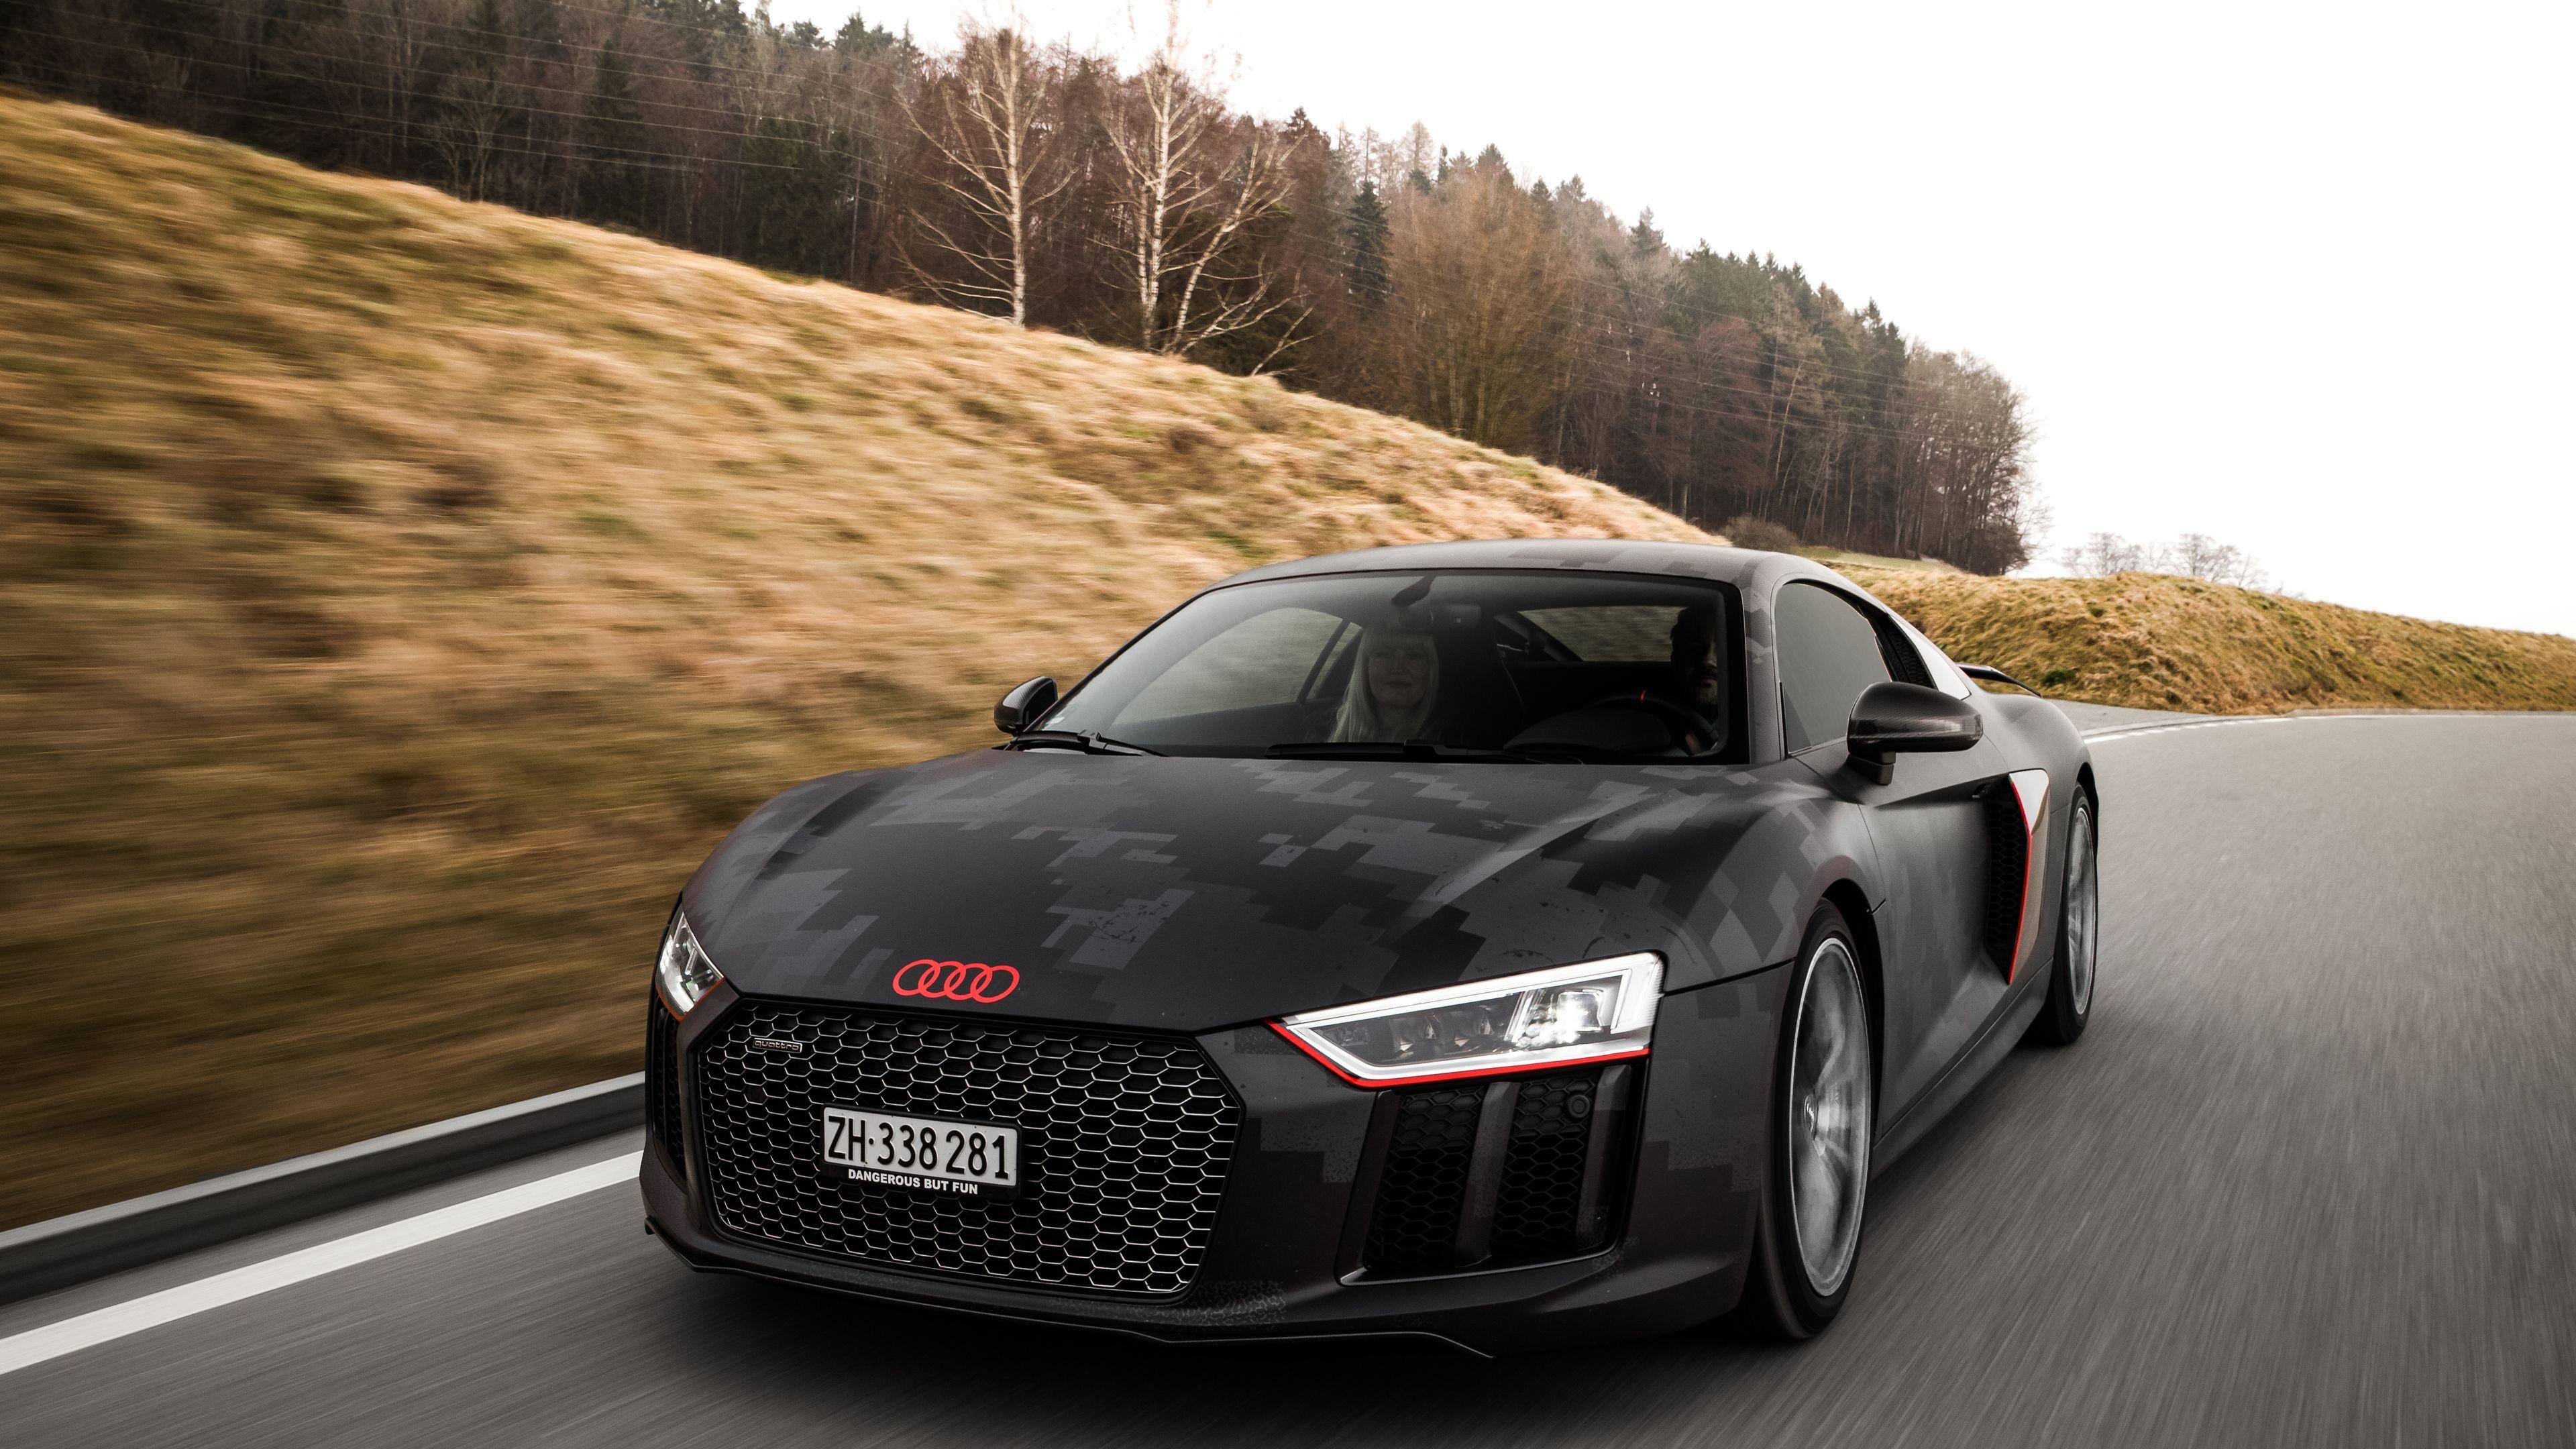 Audi R8 V10 Plus Wallpapers Wallpaper Cave